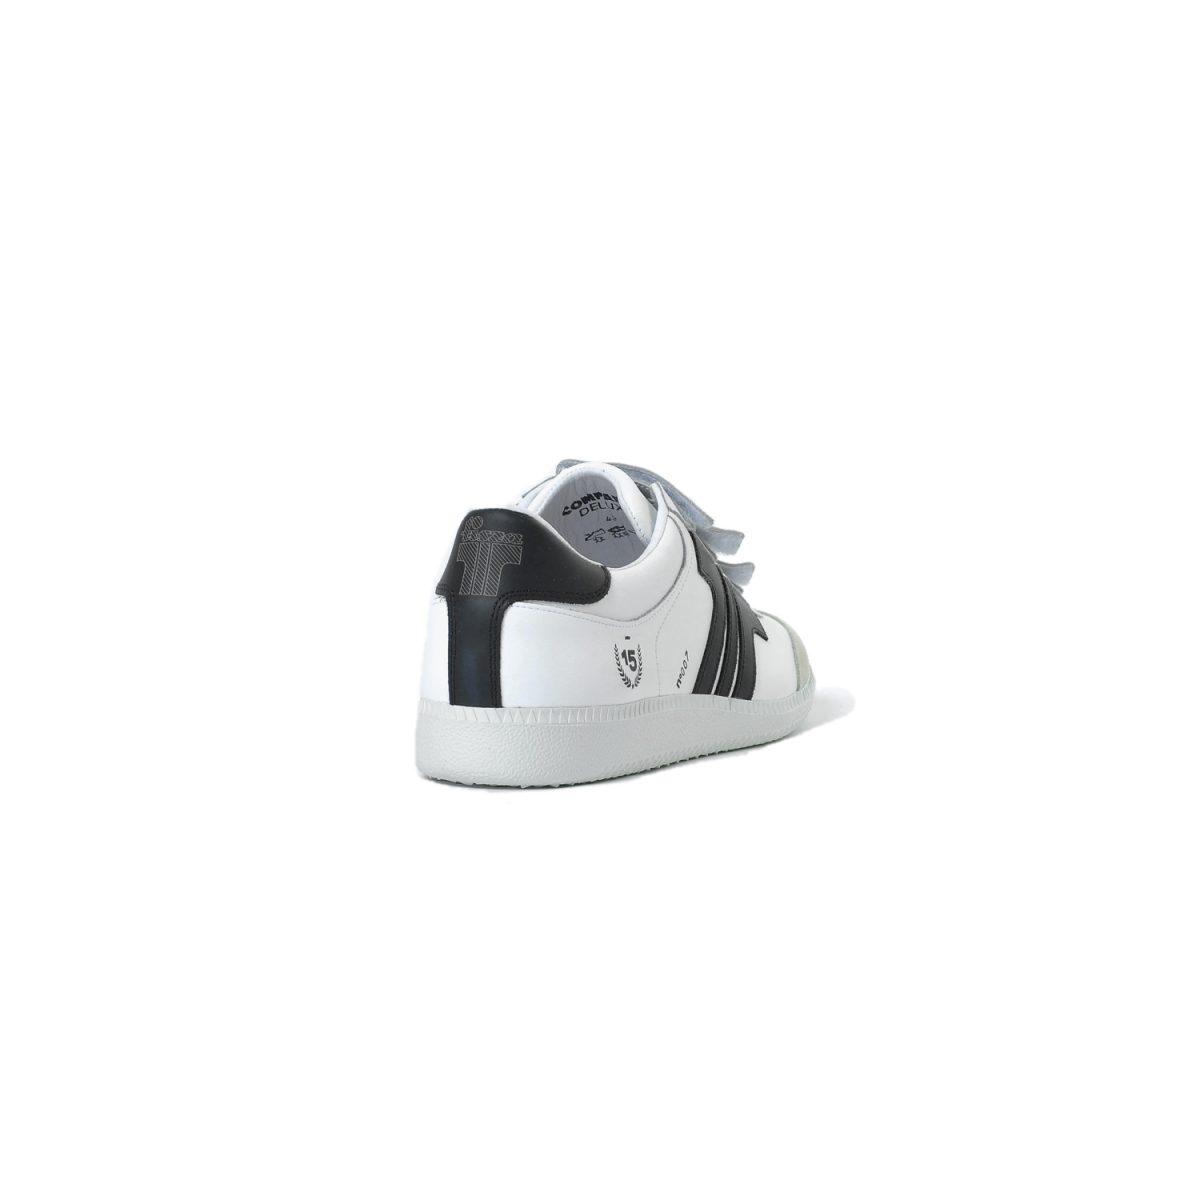 Tisza-shoes - Compakt delux - White-black